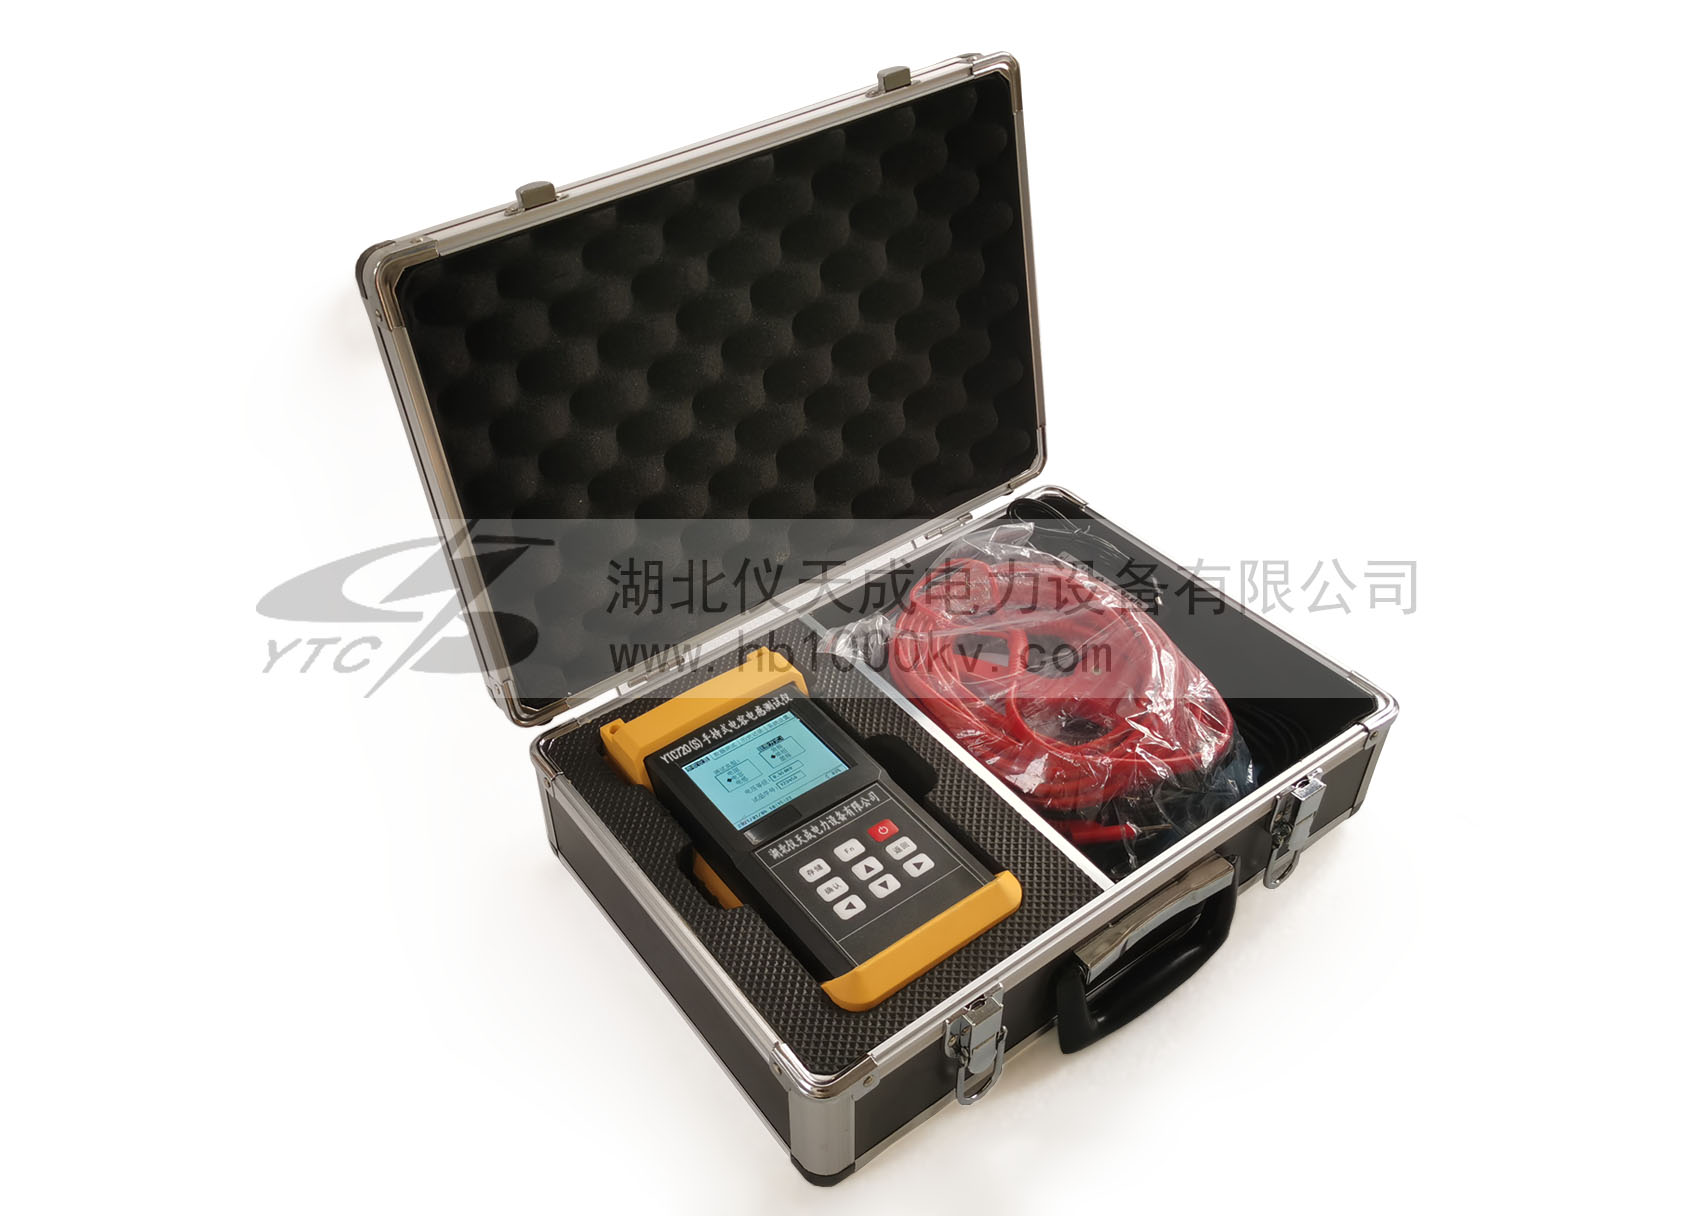 YTC720(S)手持式电容电感测试仪整体图